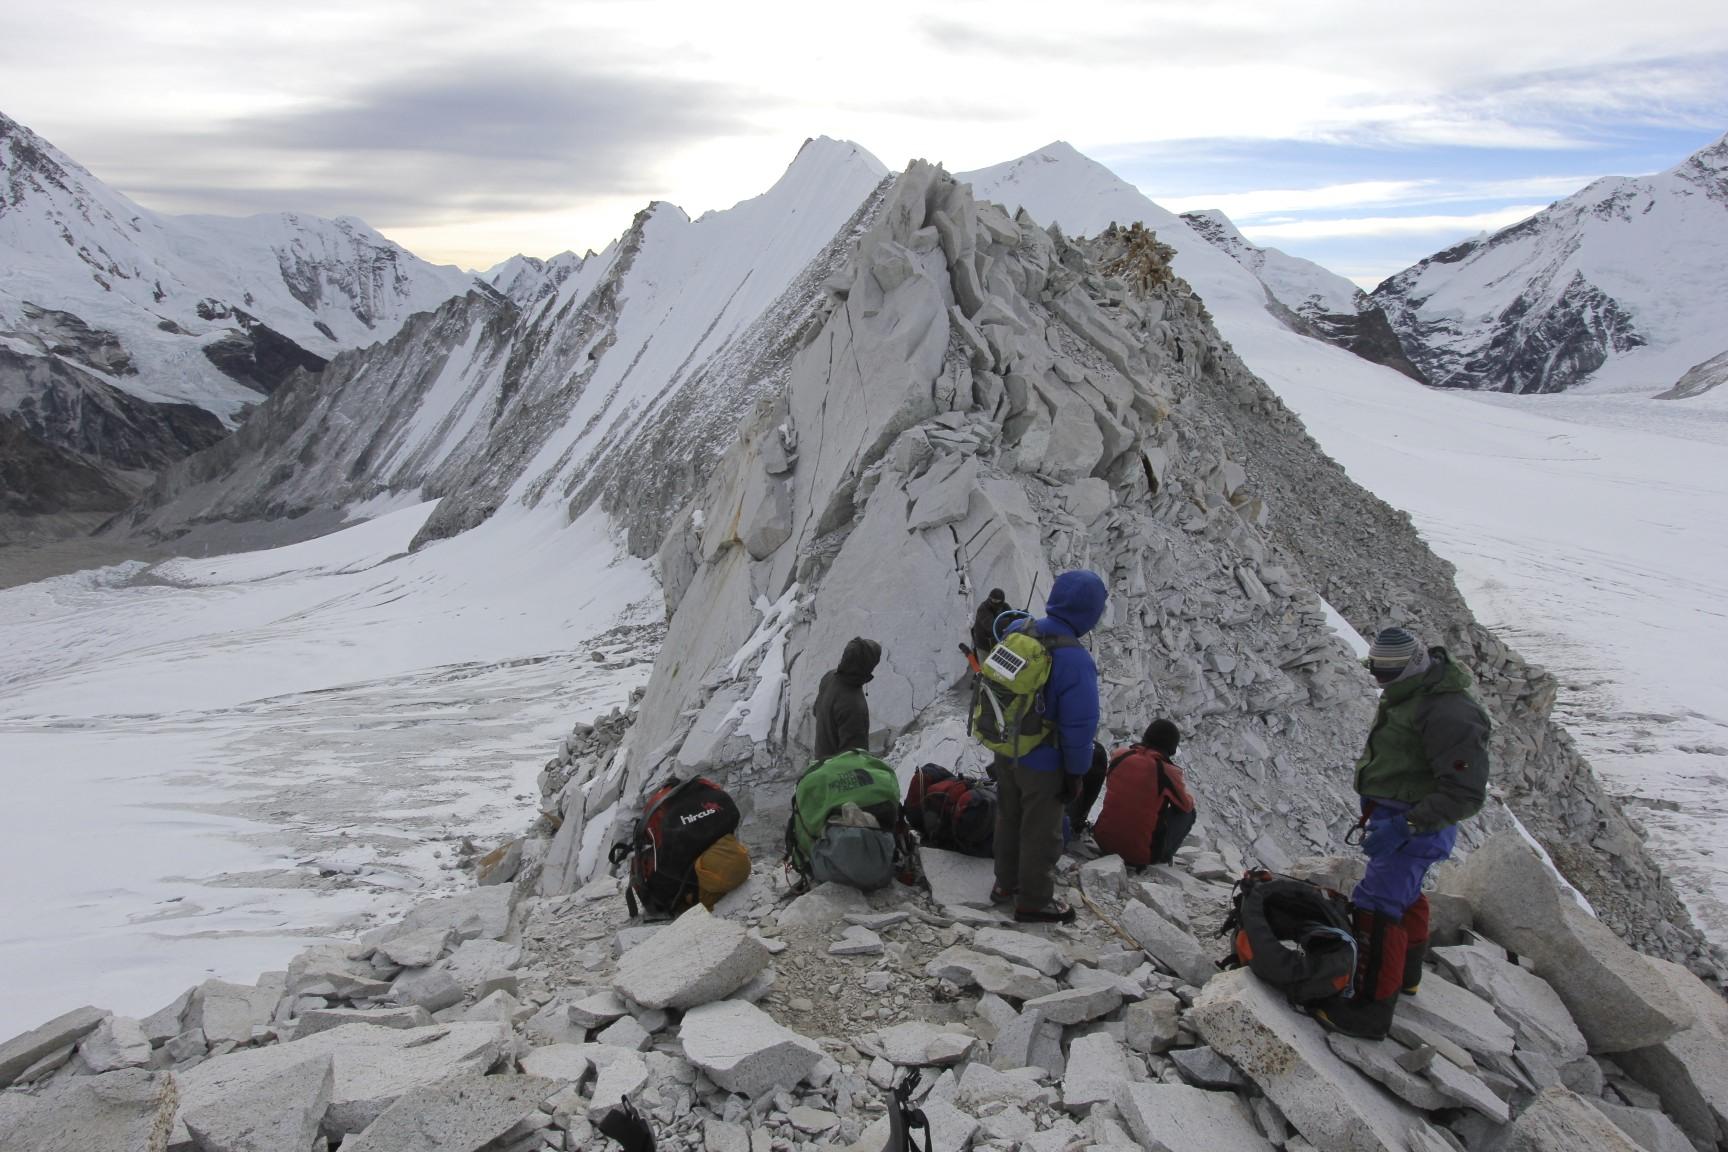 The narrow rib of Sherpani Col early in the morning.